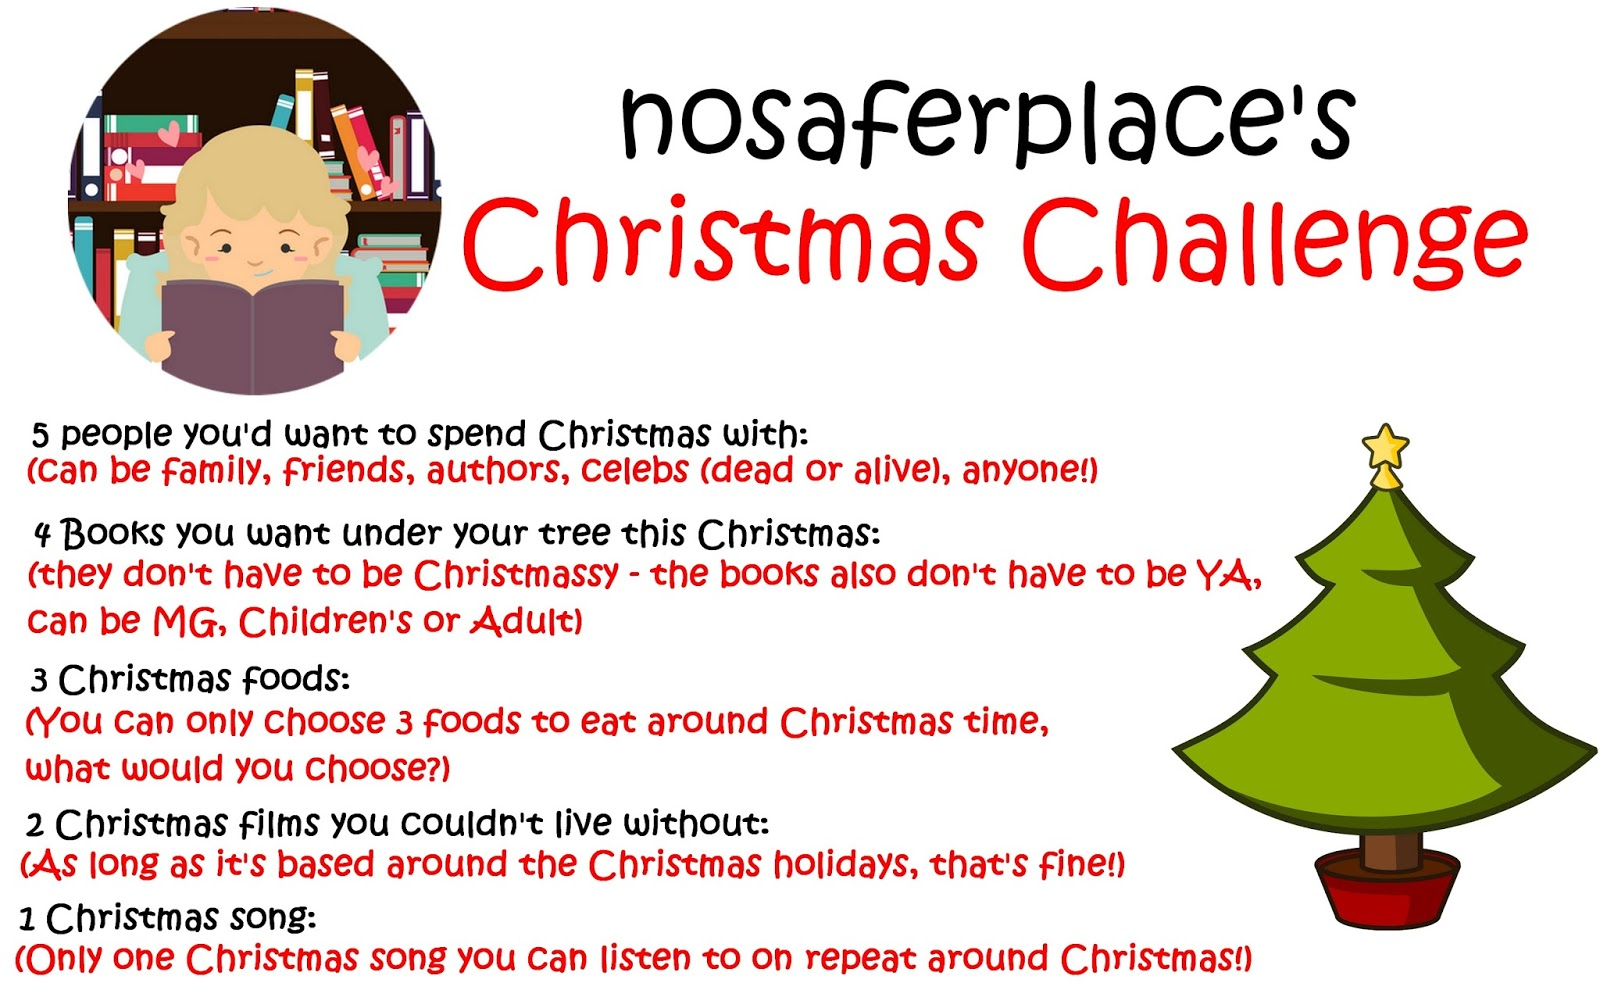 December 2017 - nosaferplace